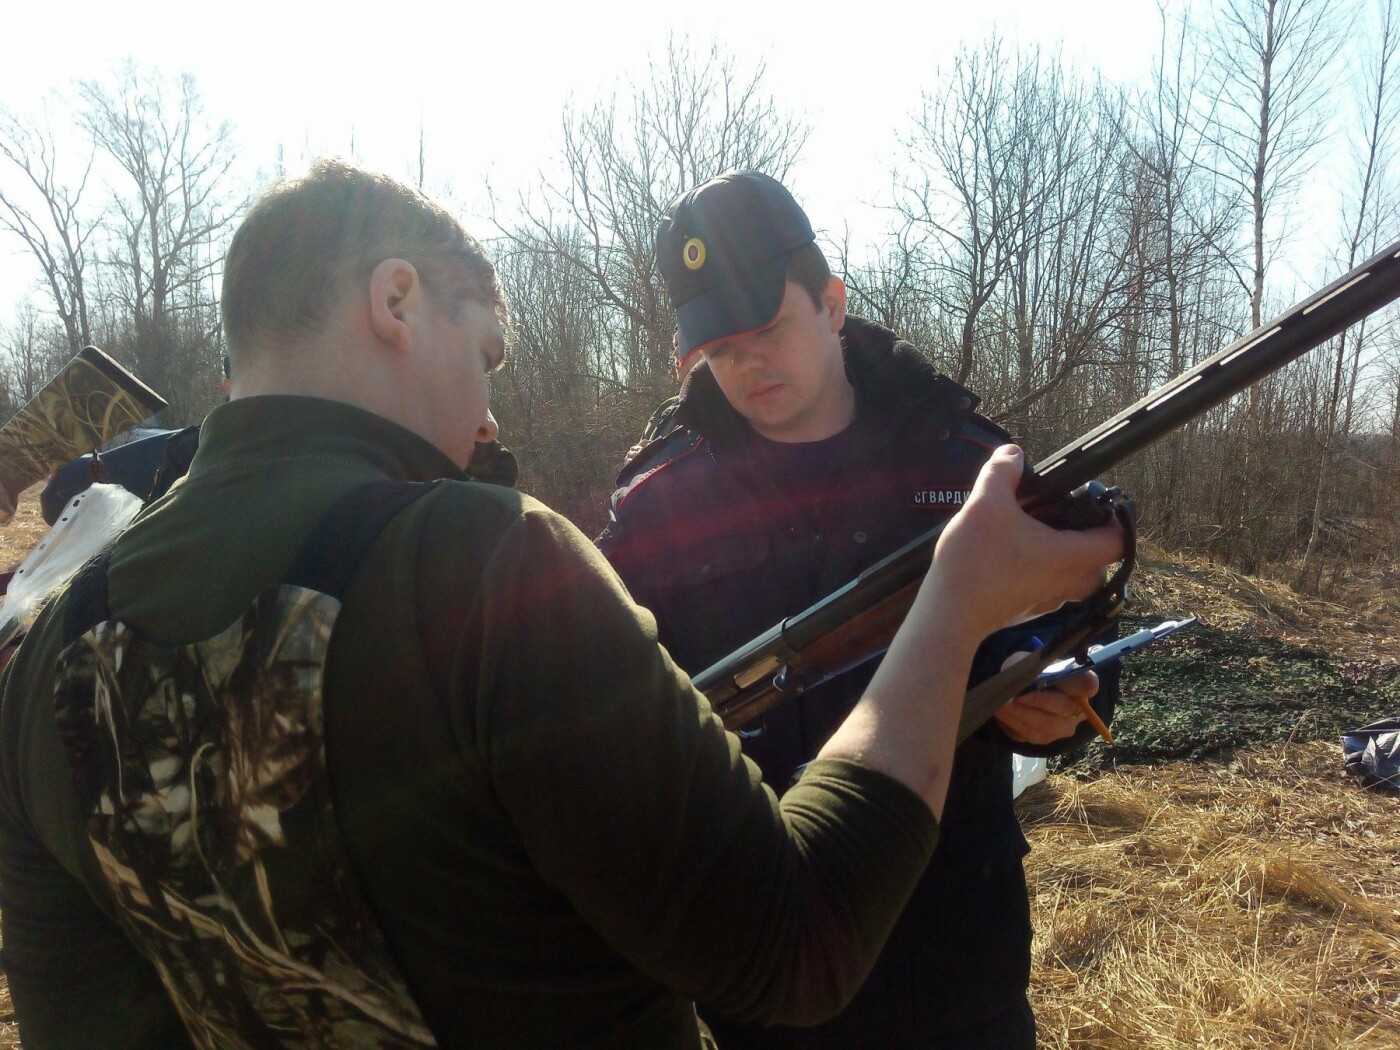 В Псковской области проведено оперативно-профилактическое мероприятие «Охота», фото-2